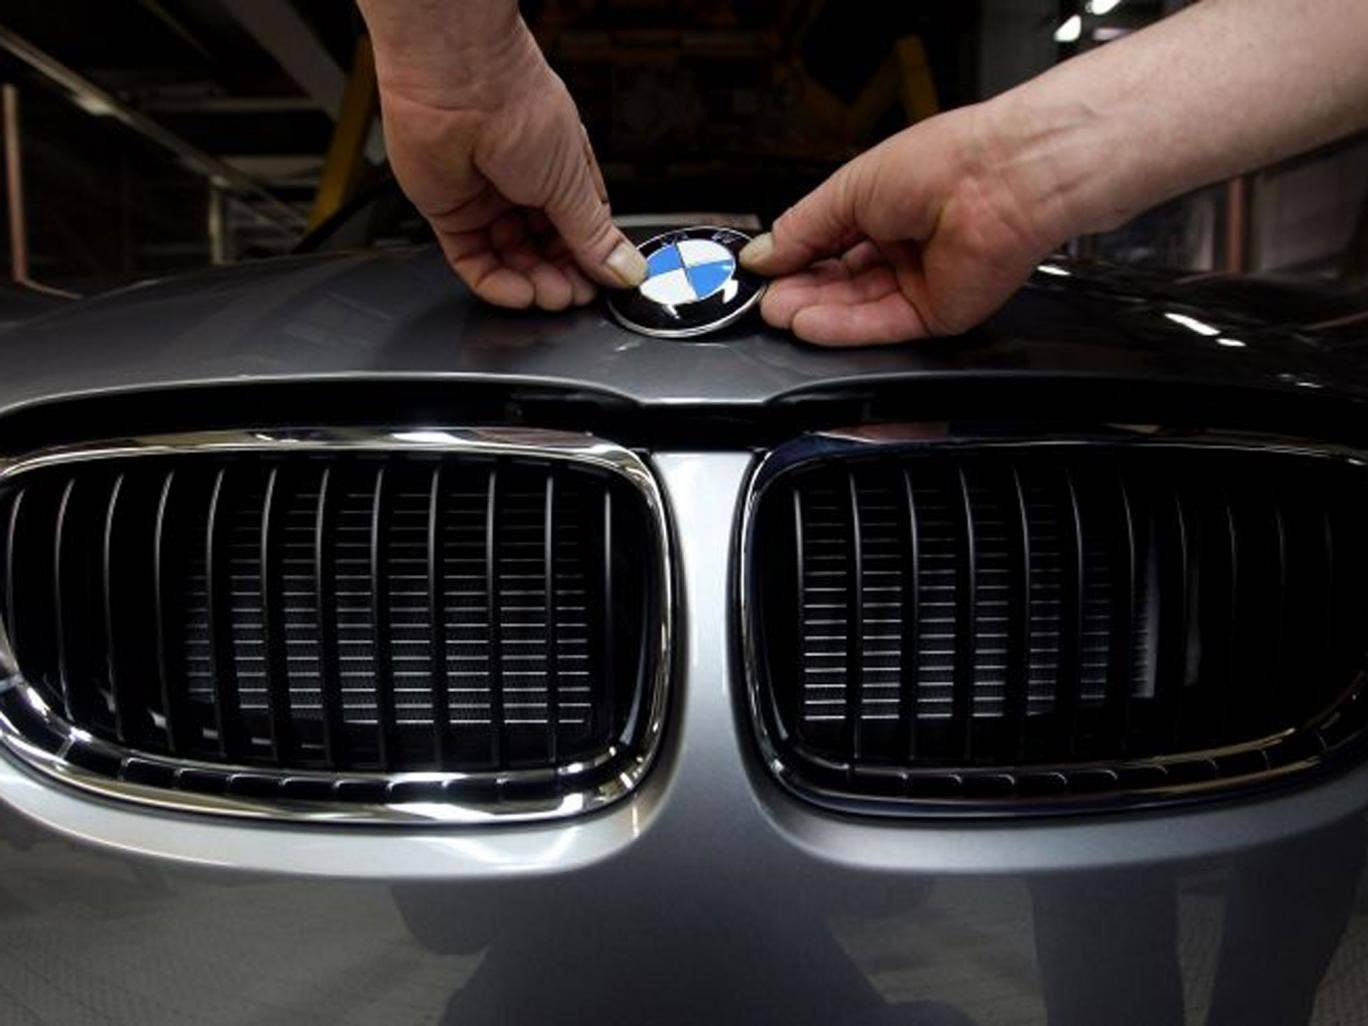 Eurozone companies such as BMW still have a global footprint